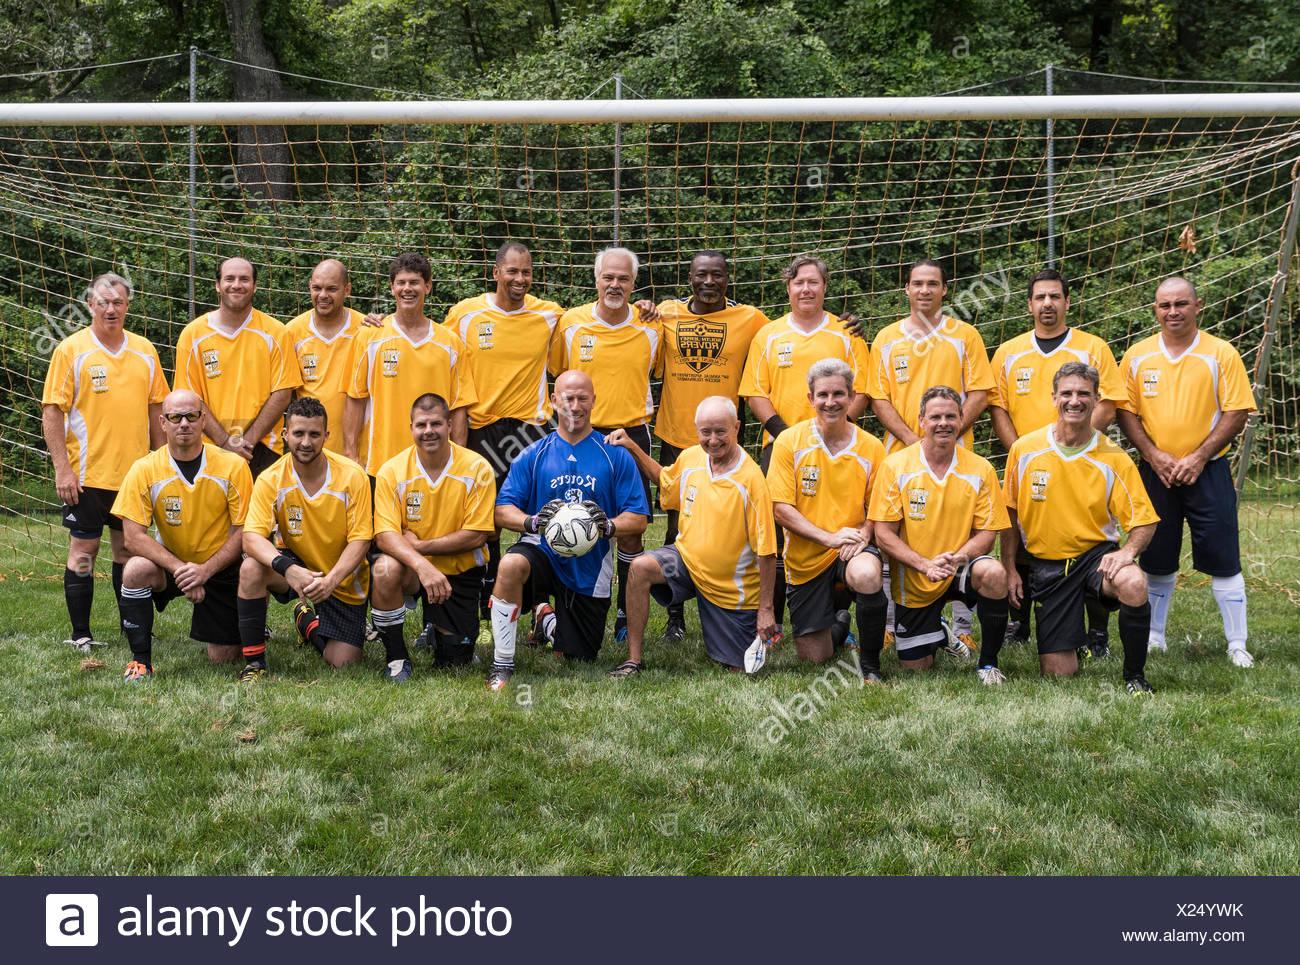 Master division amateur soccer team. - Stock Image